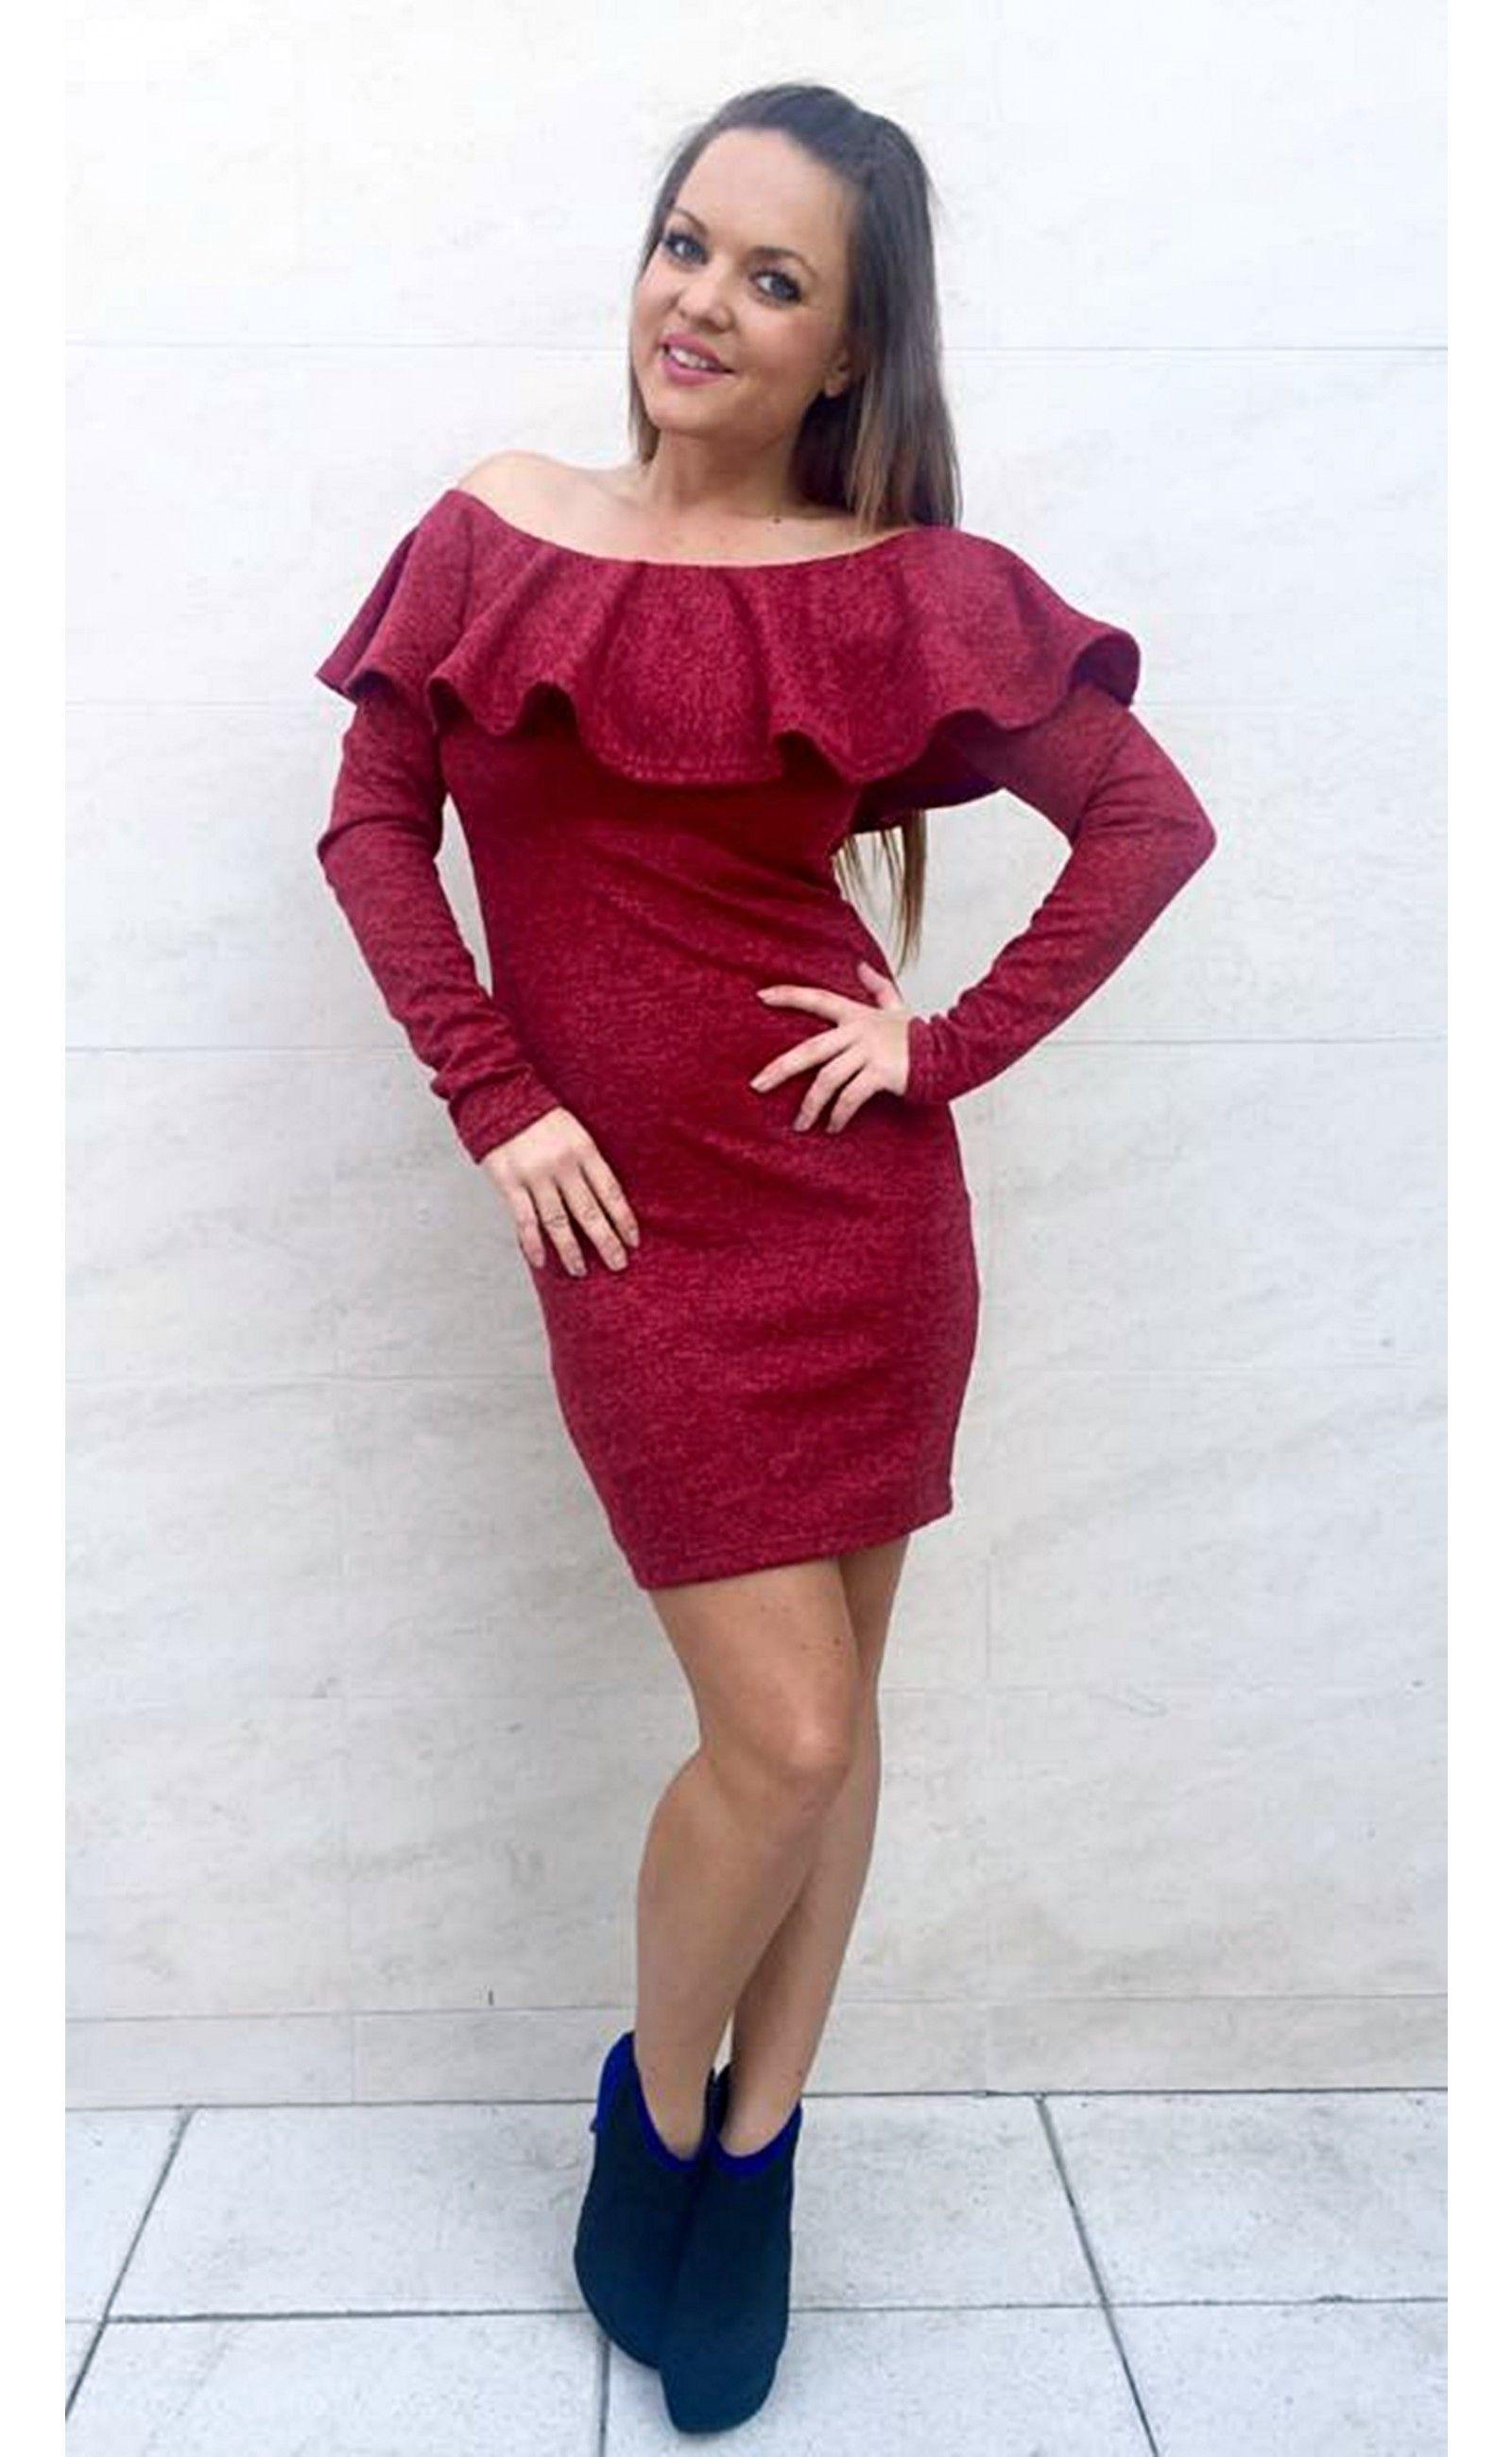 Alkalmi Spanyol vállú ruha a0e243775d